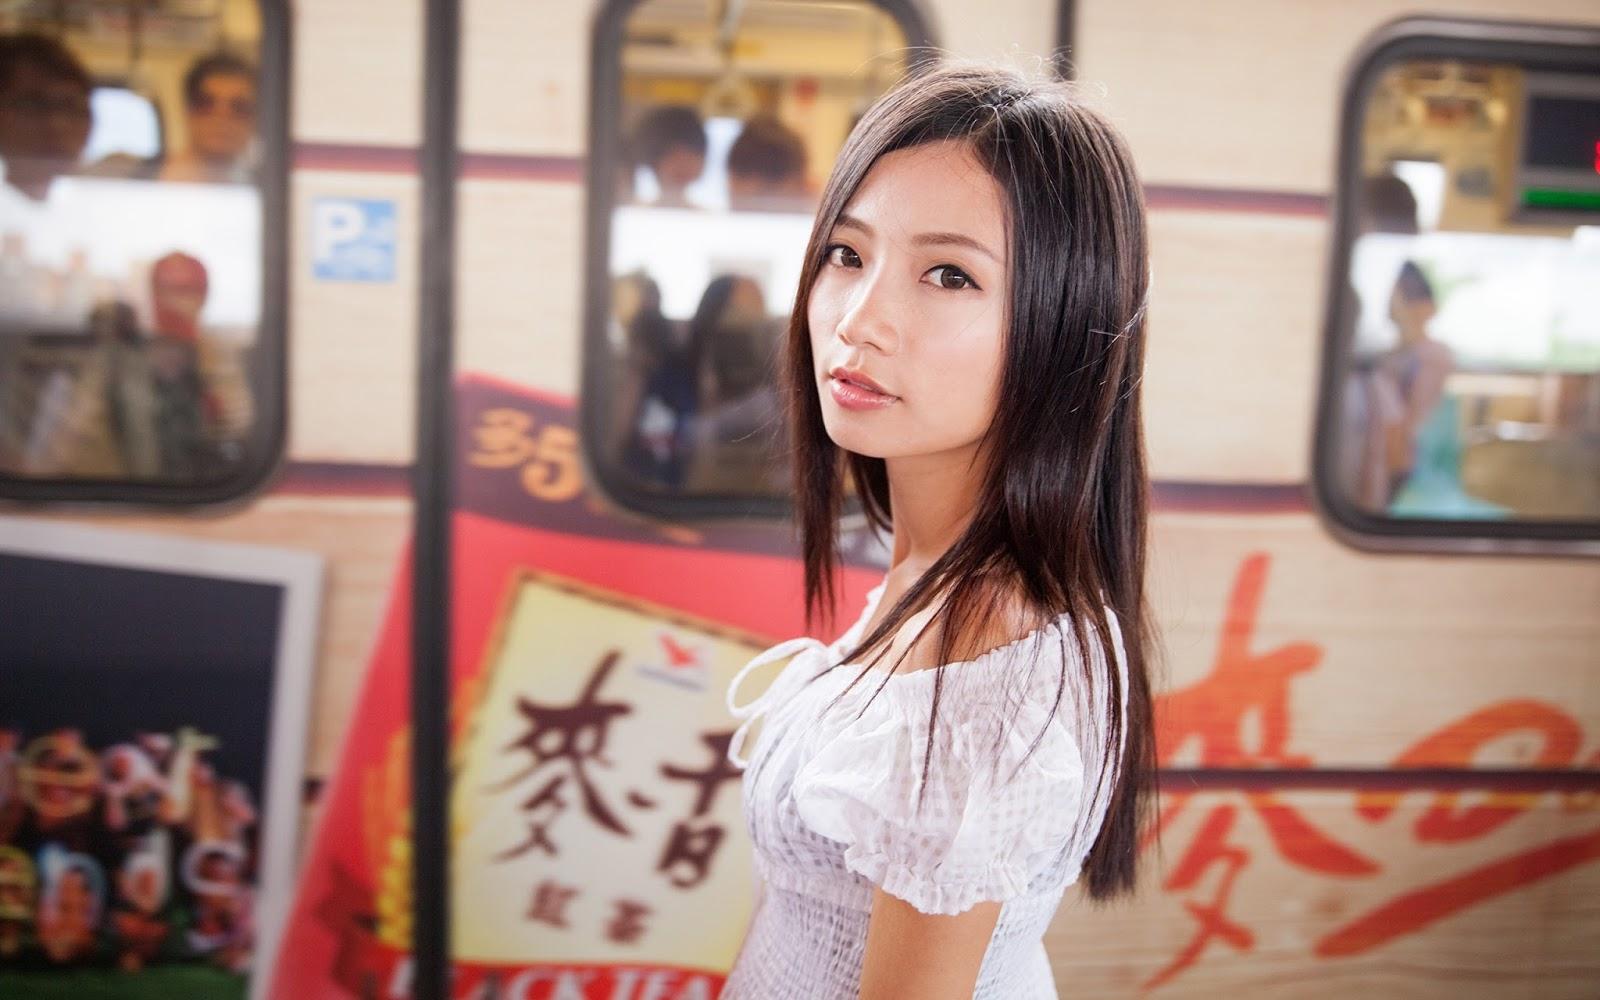 Japanese Girls Wallpapers